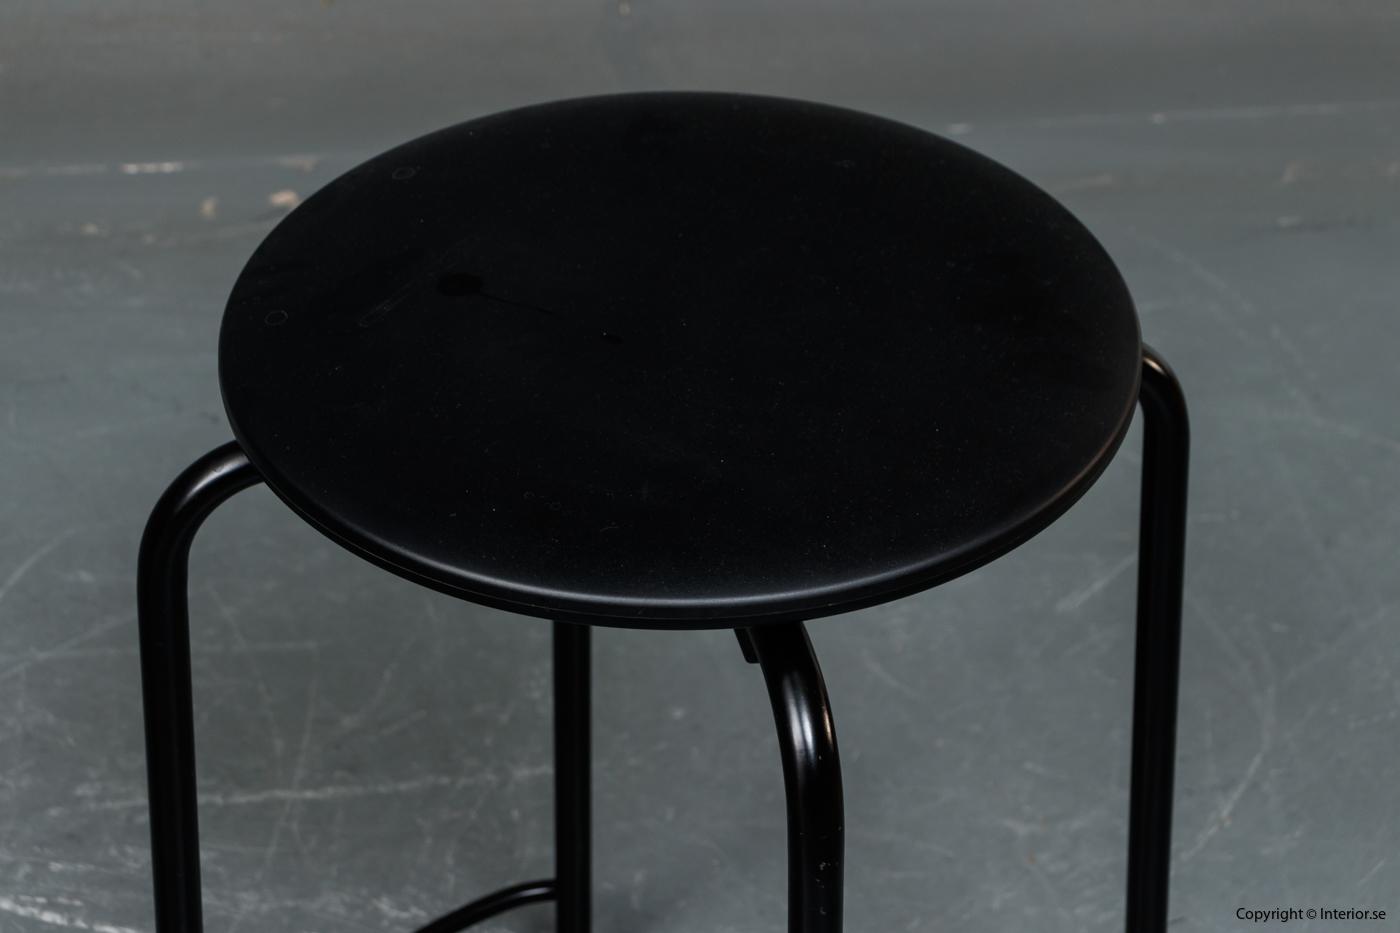 Stapelbara pallar, Holmris B8 Stools stackable stools 3